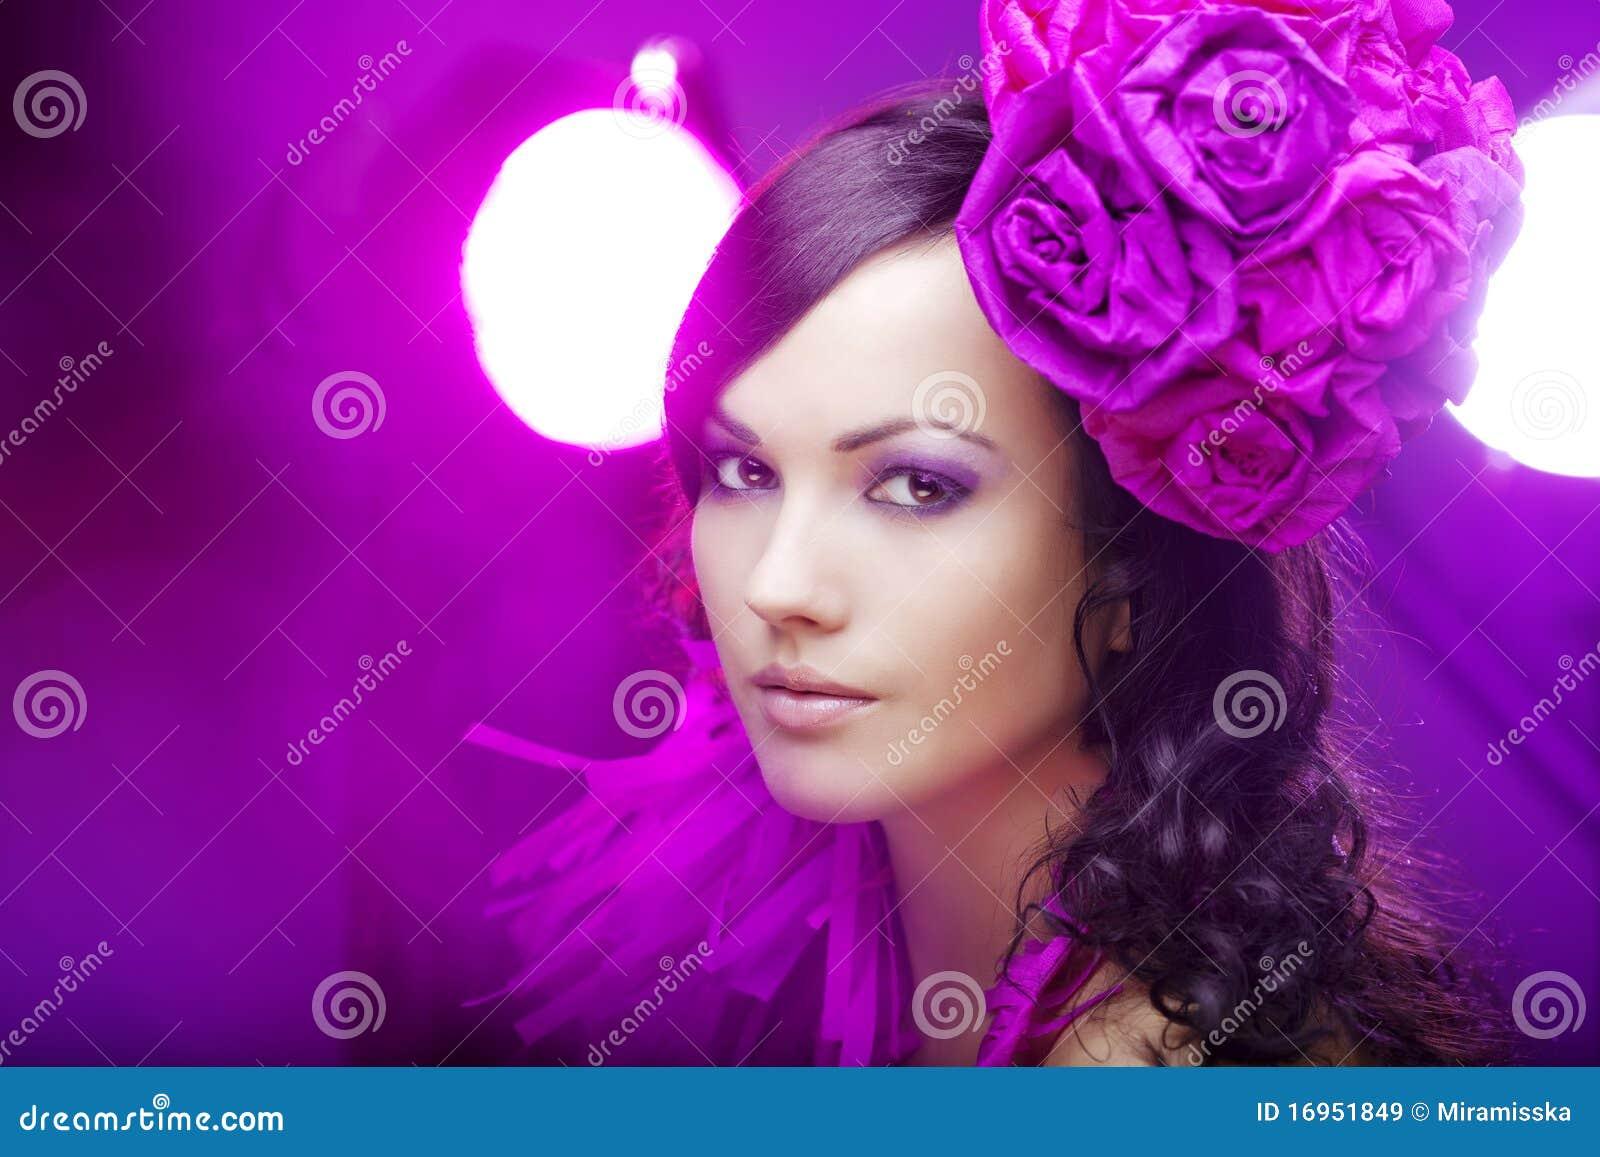 Mooi meisje in een hoed met rozen